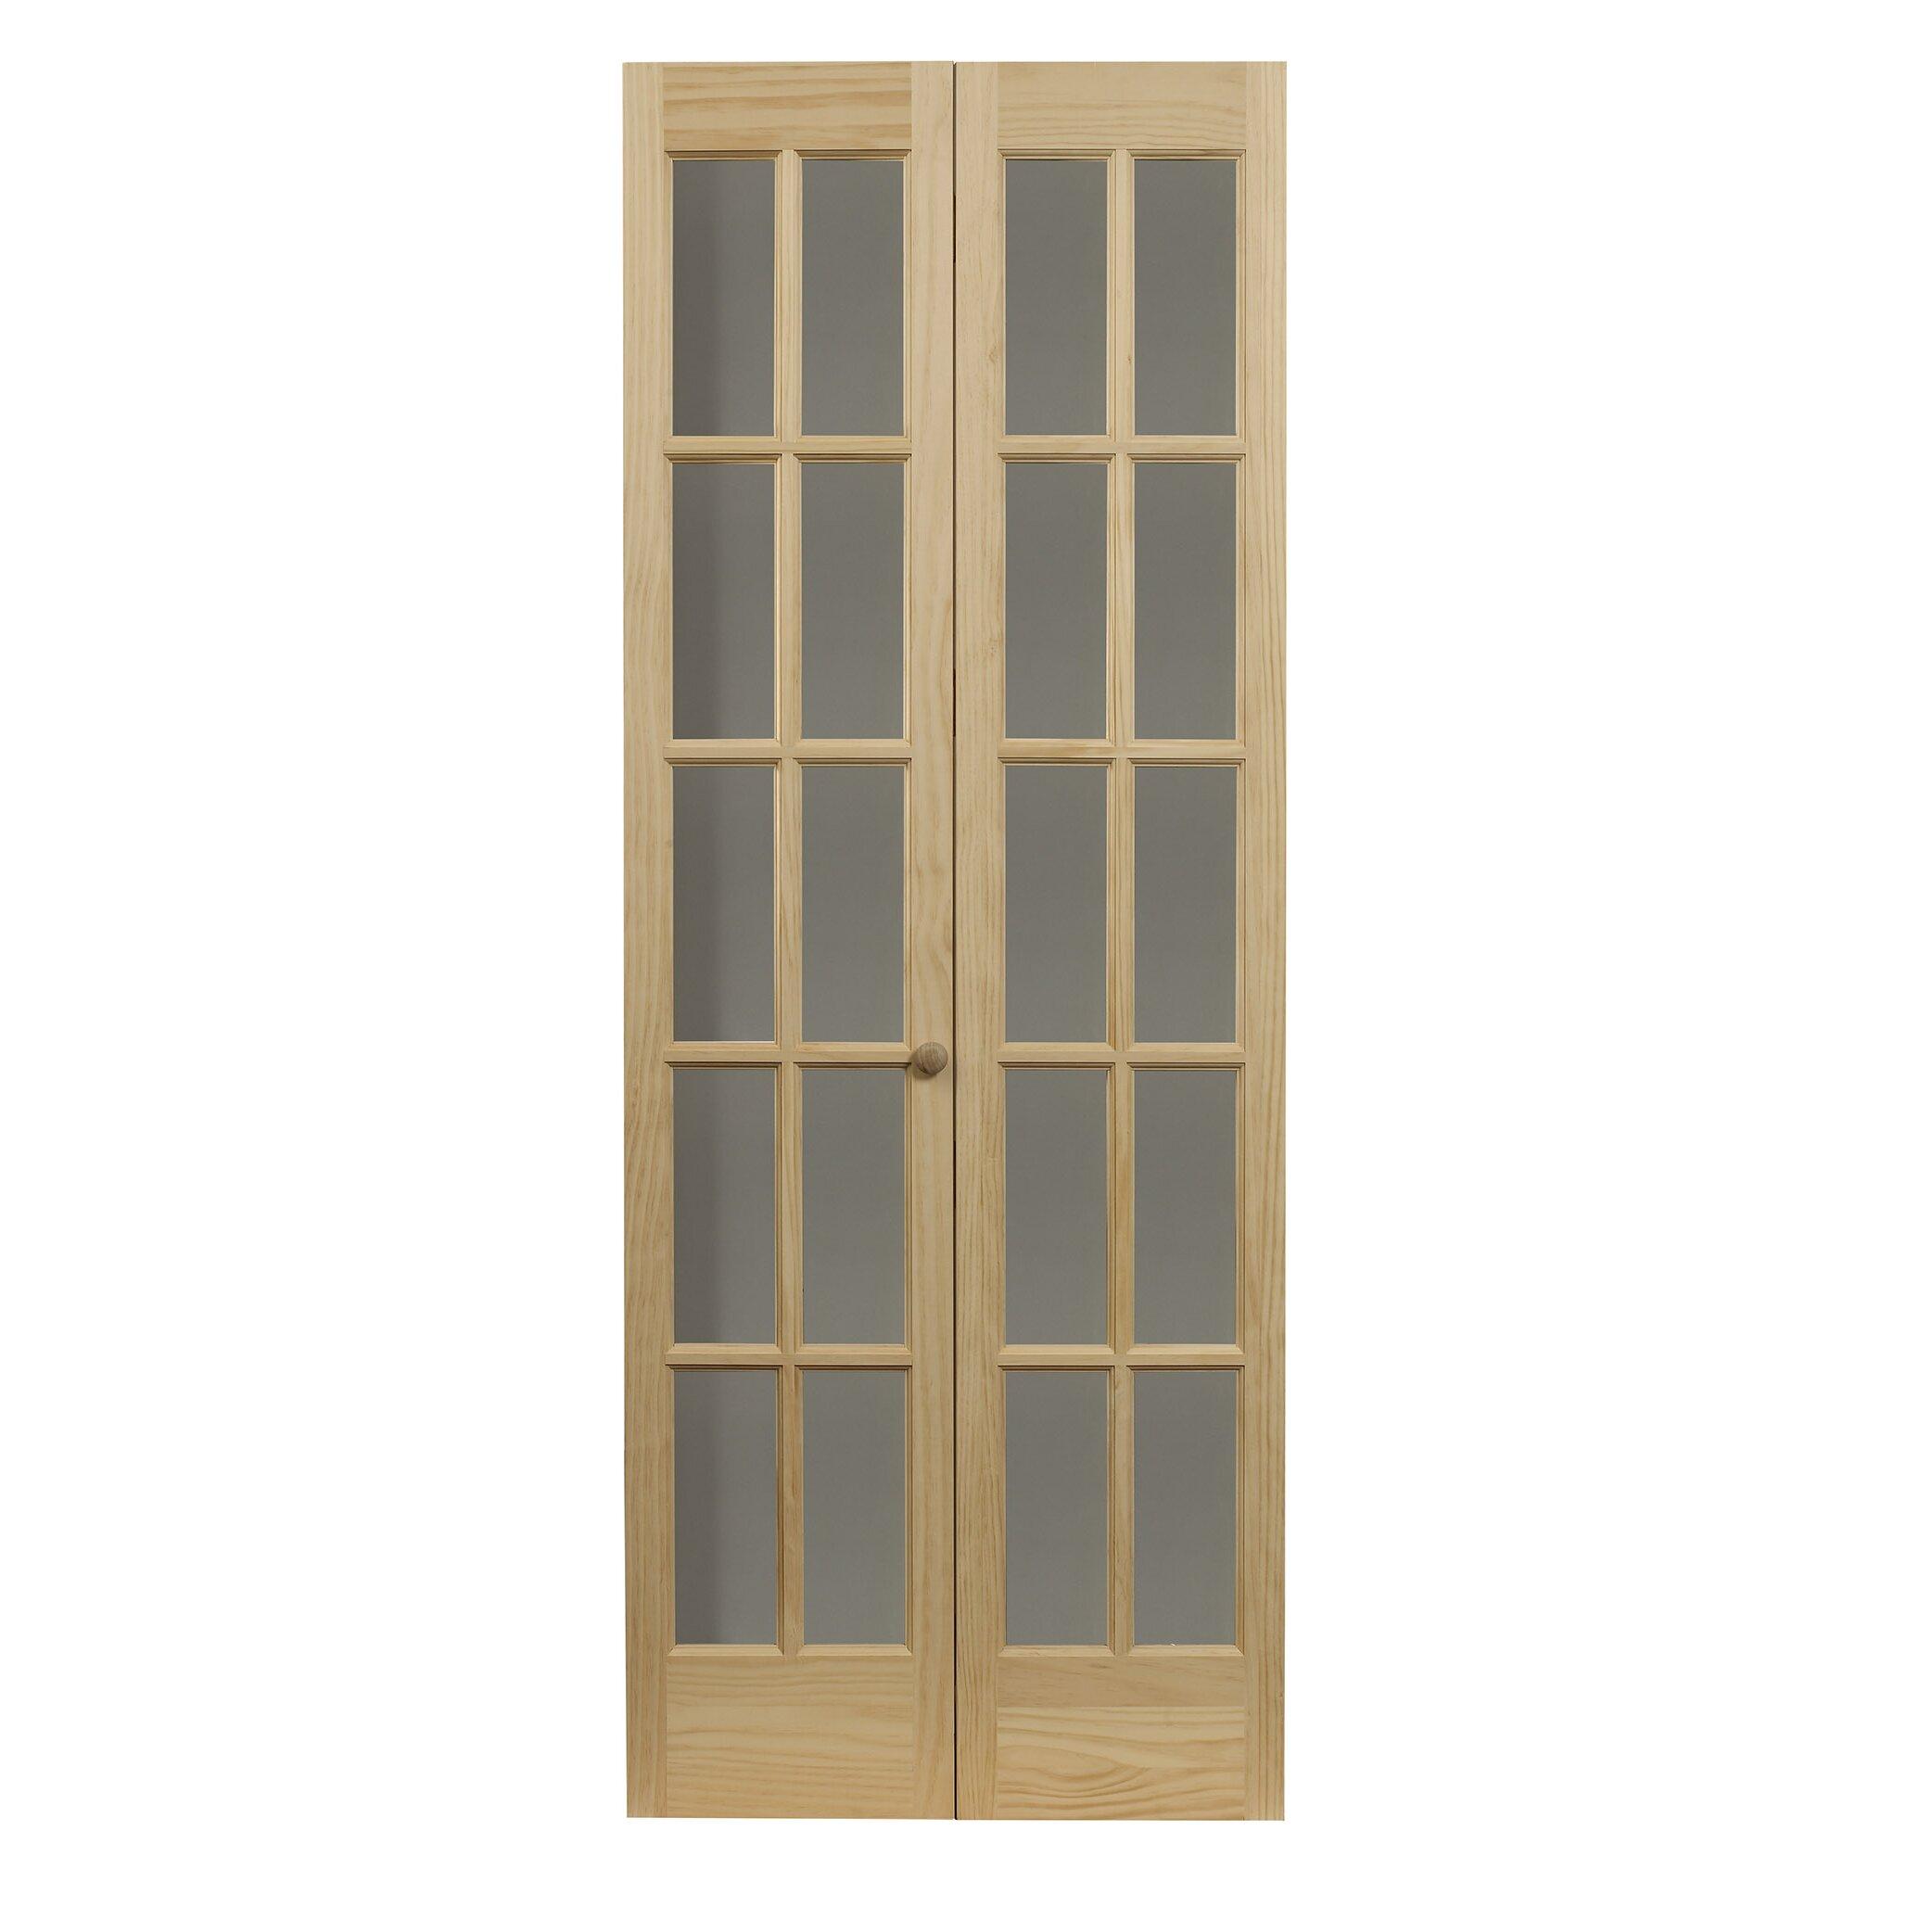 LTL Bi Fold Doors Wood Bi Fold Interior Door